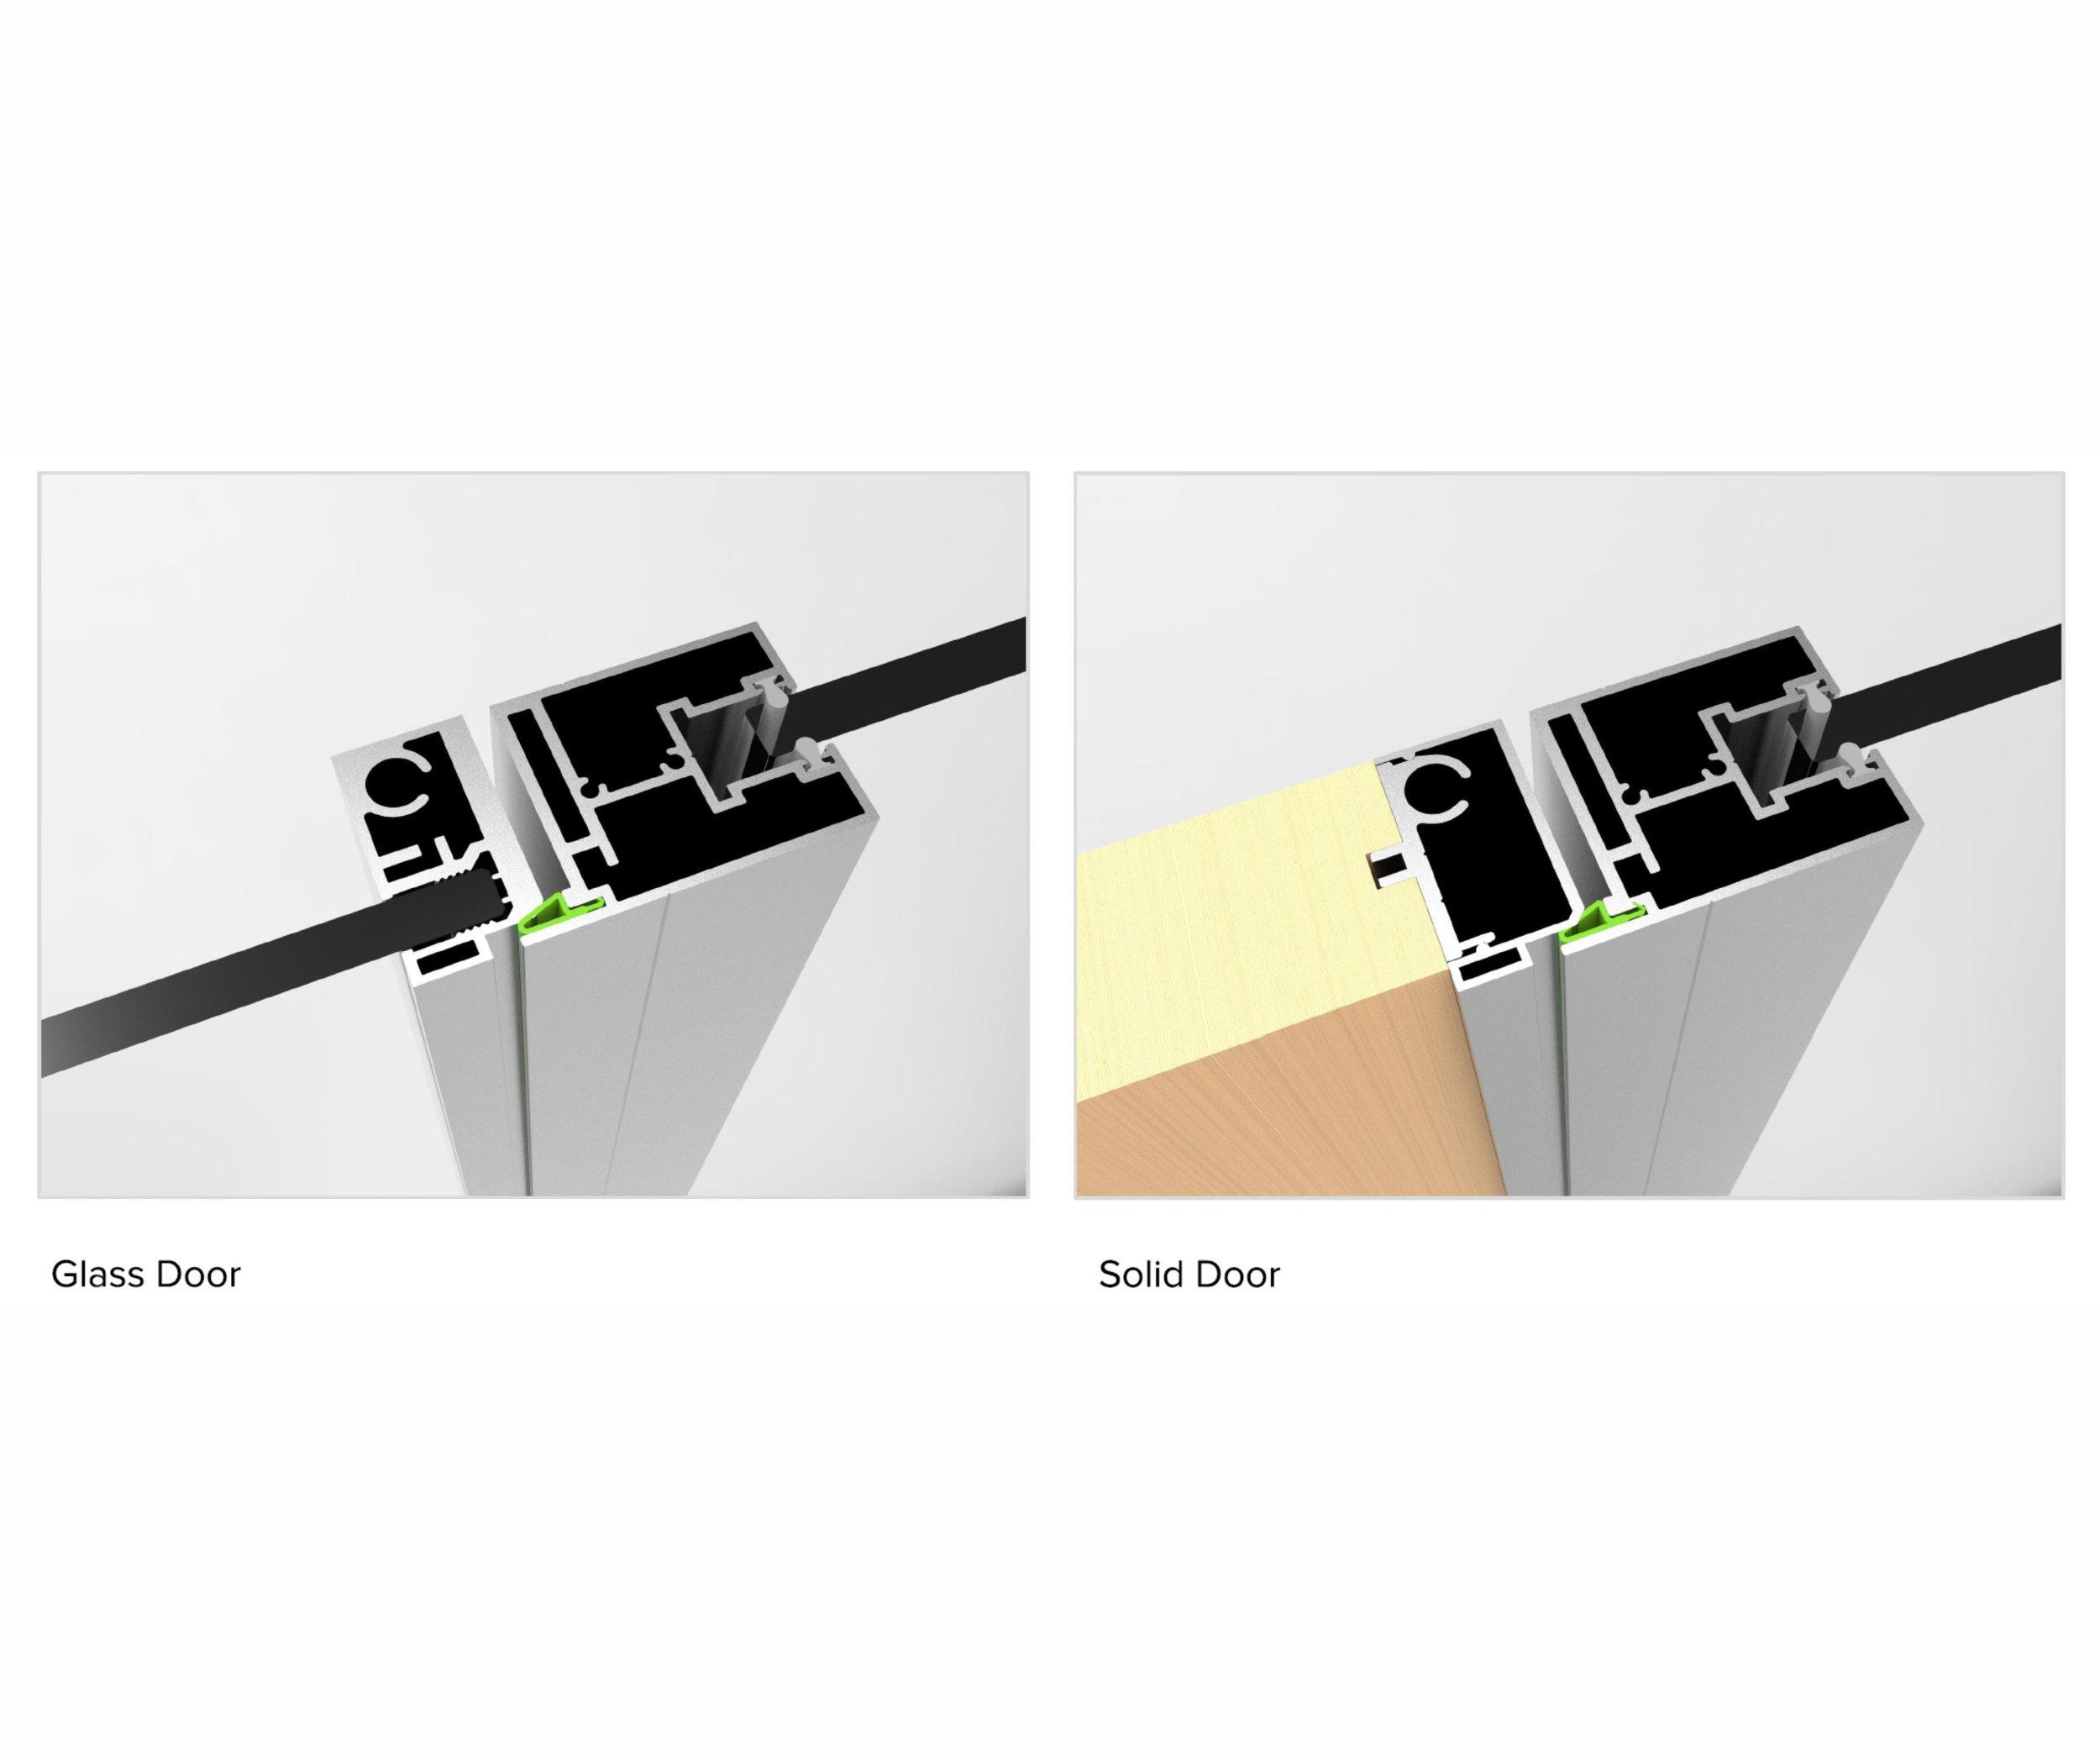 Glass pivot leaf vs. solid pivot door.